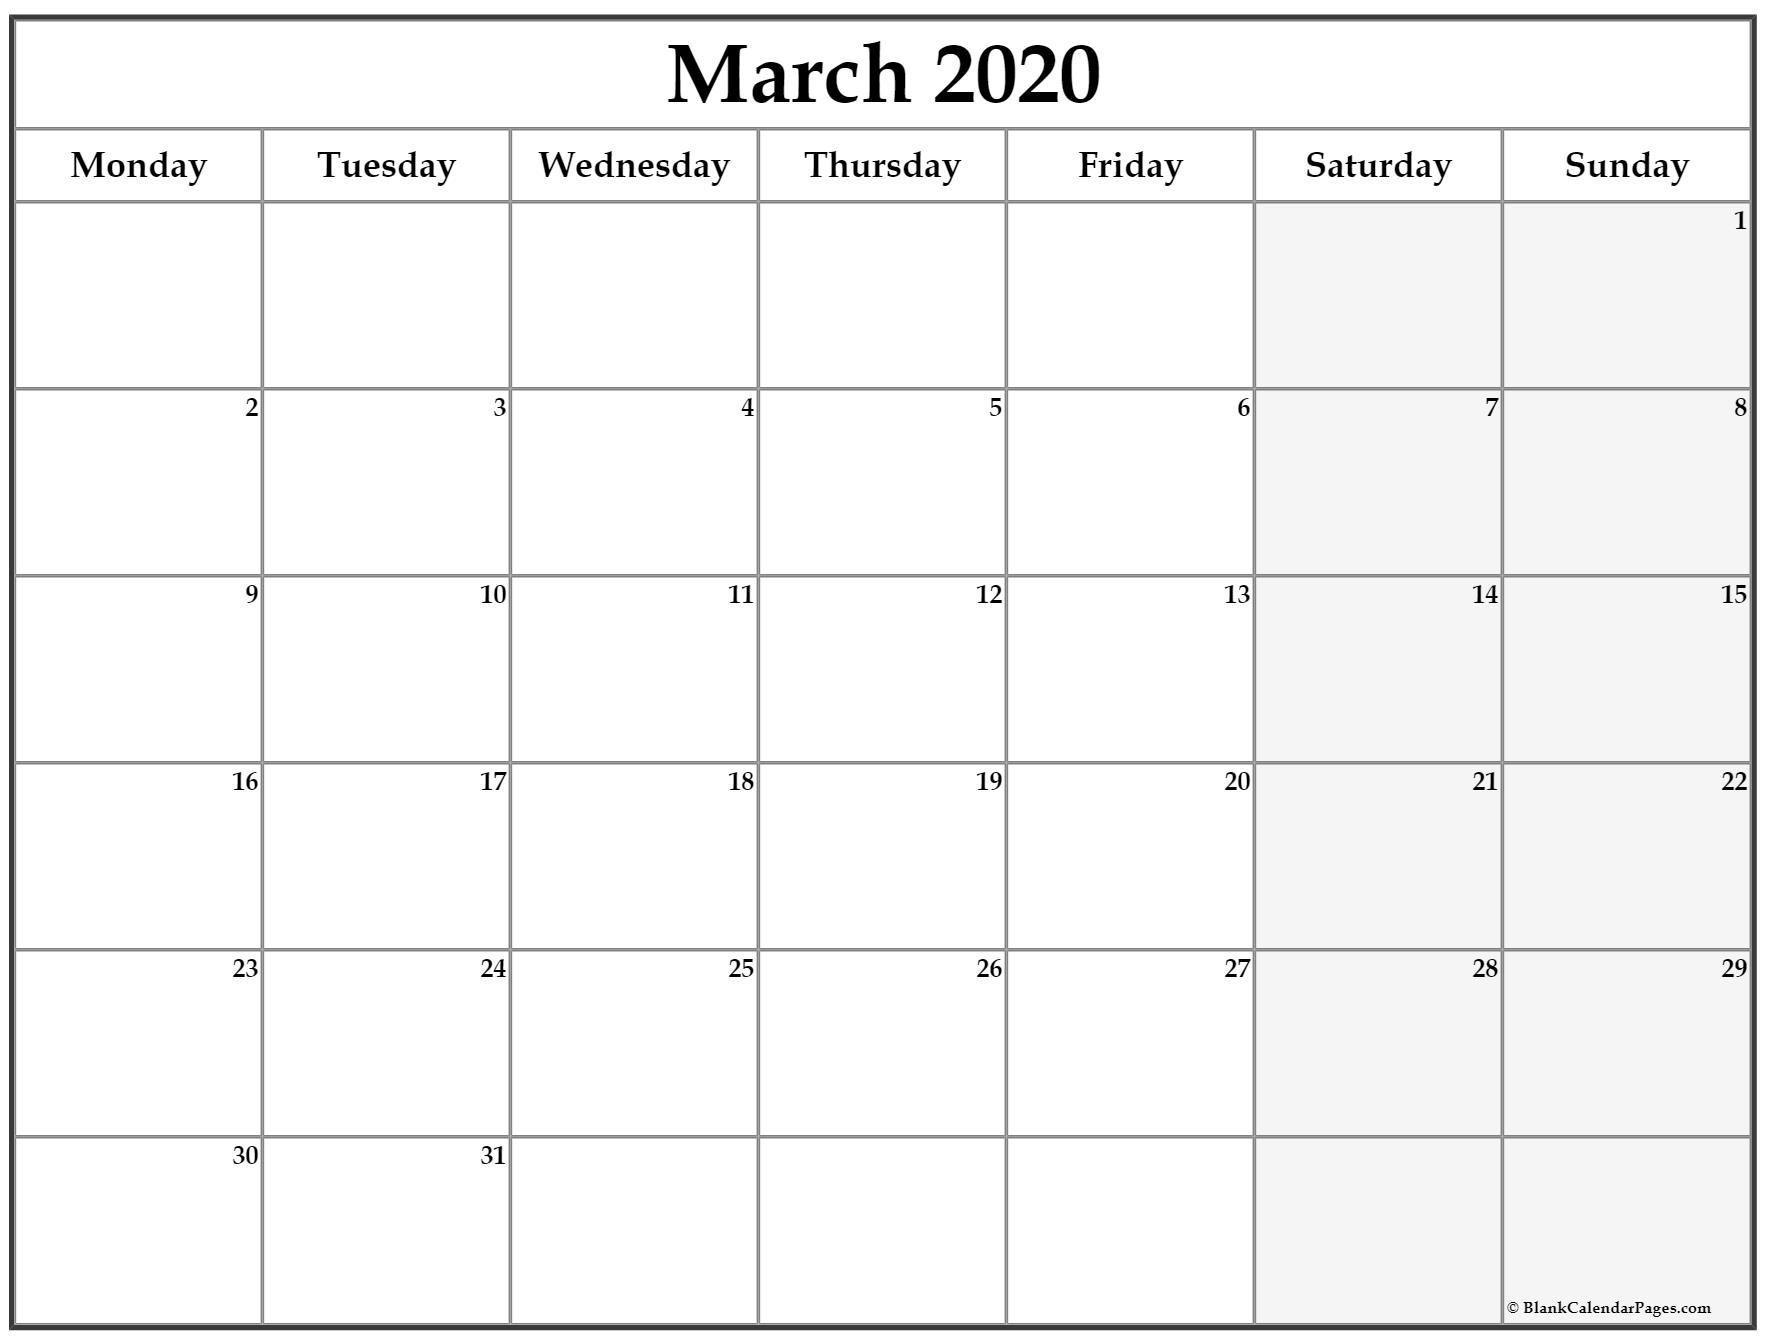 march 2020 monday calendar | monday to sunday